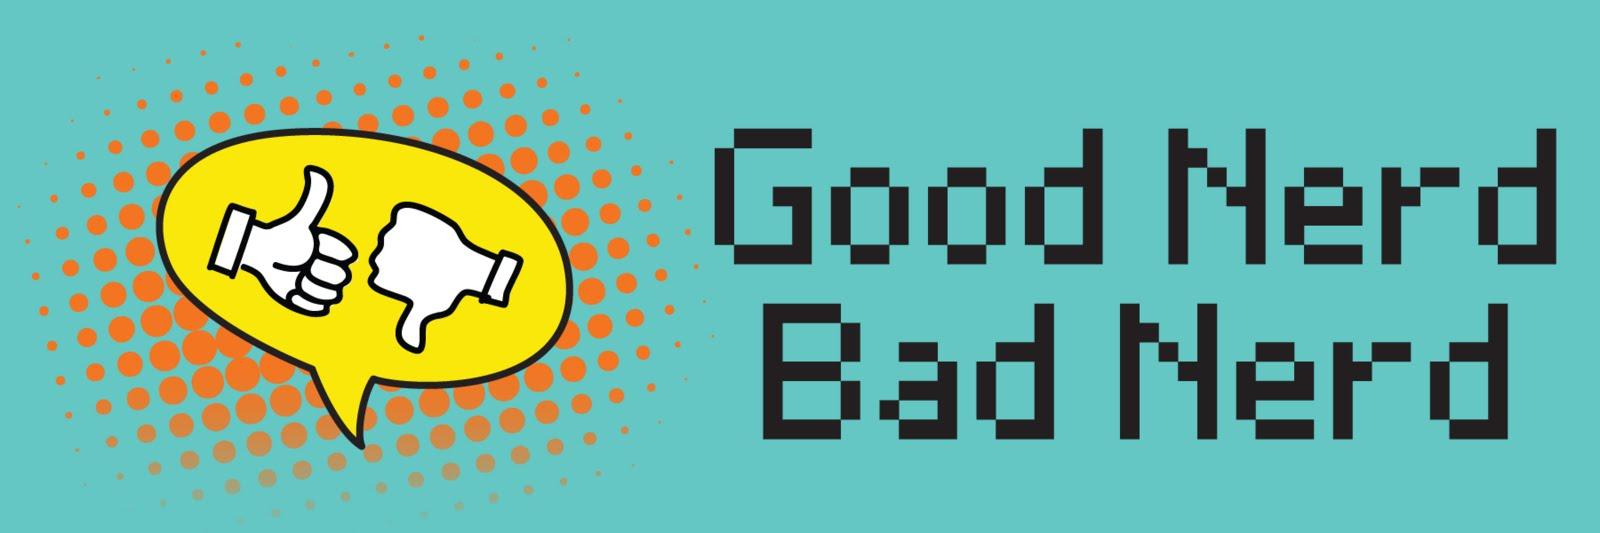 Good Nerd Bad Nerd Technology